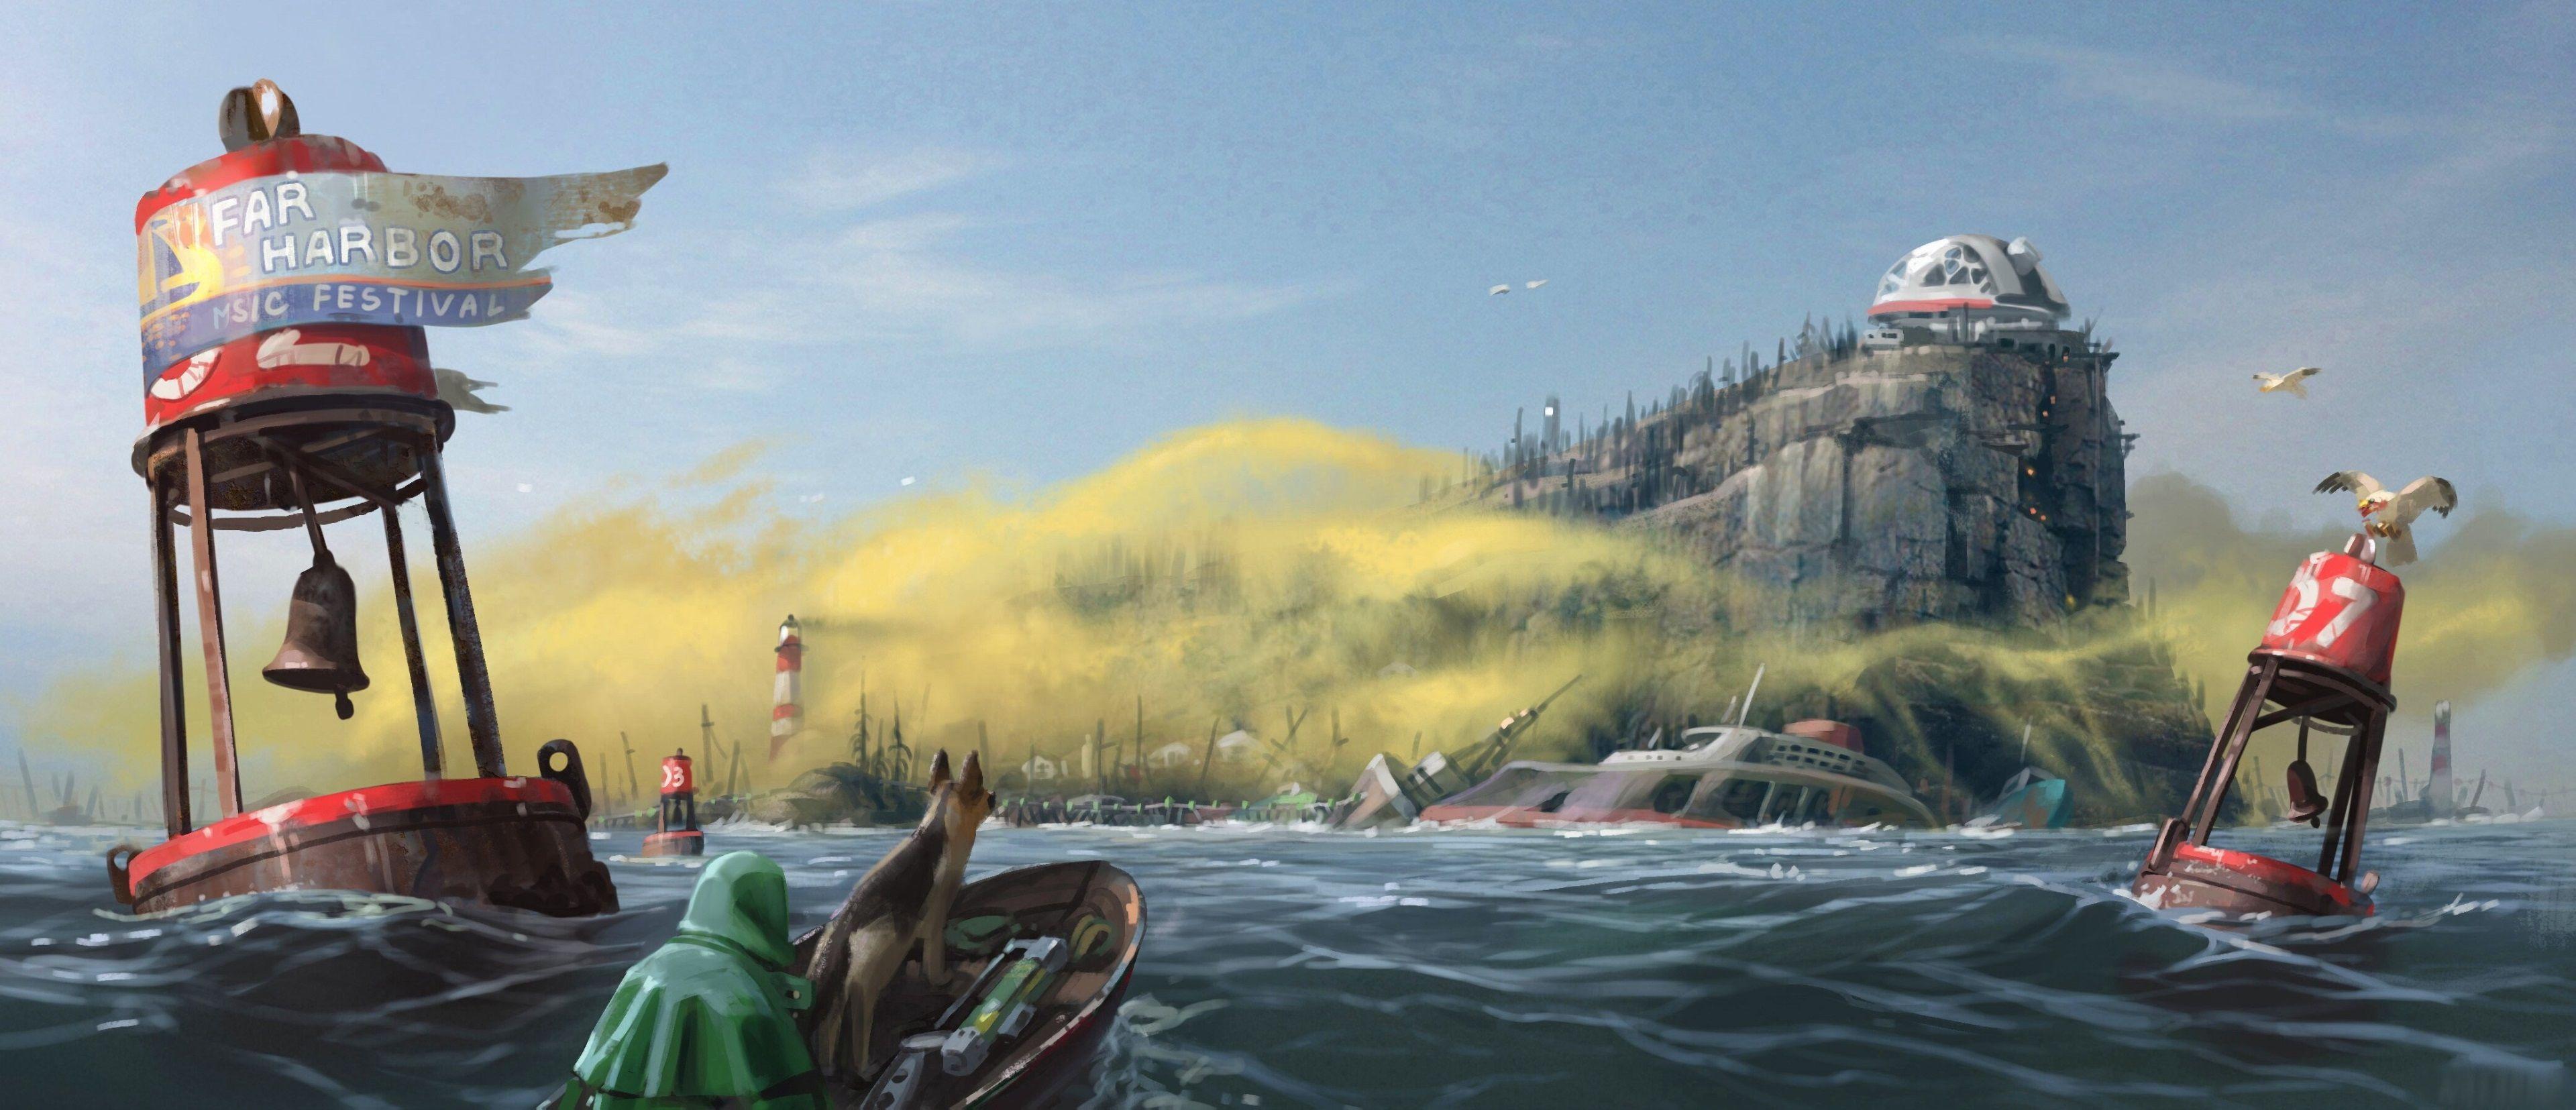 3840x1655 Fallout 4 Far Harbor 4k Free Download Wallpaper Fallout 4 Wallpapers Fallout 4 Far Harbor Fallout Art